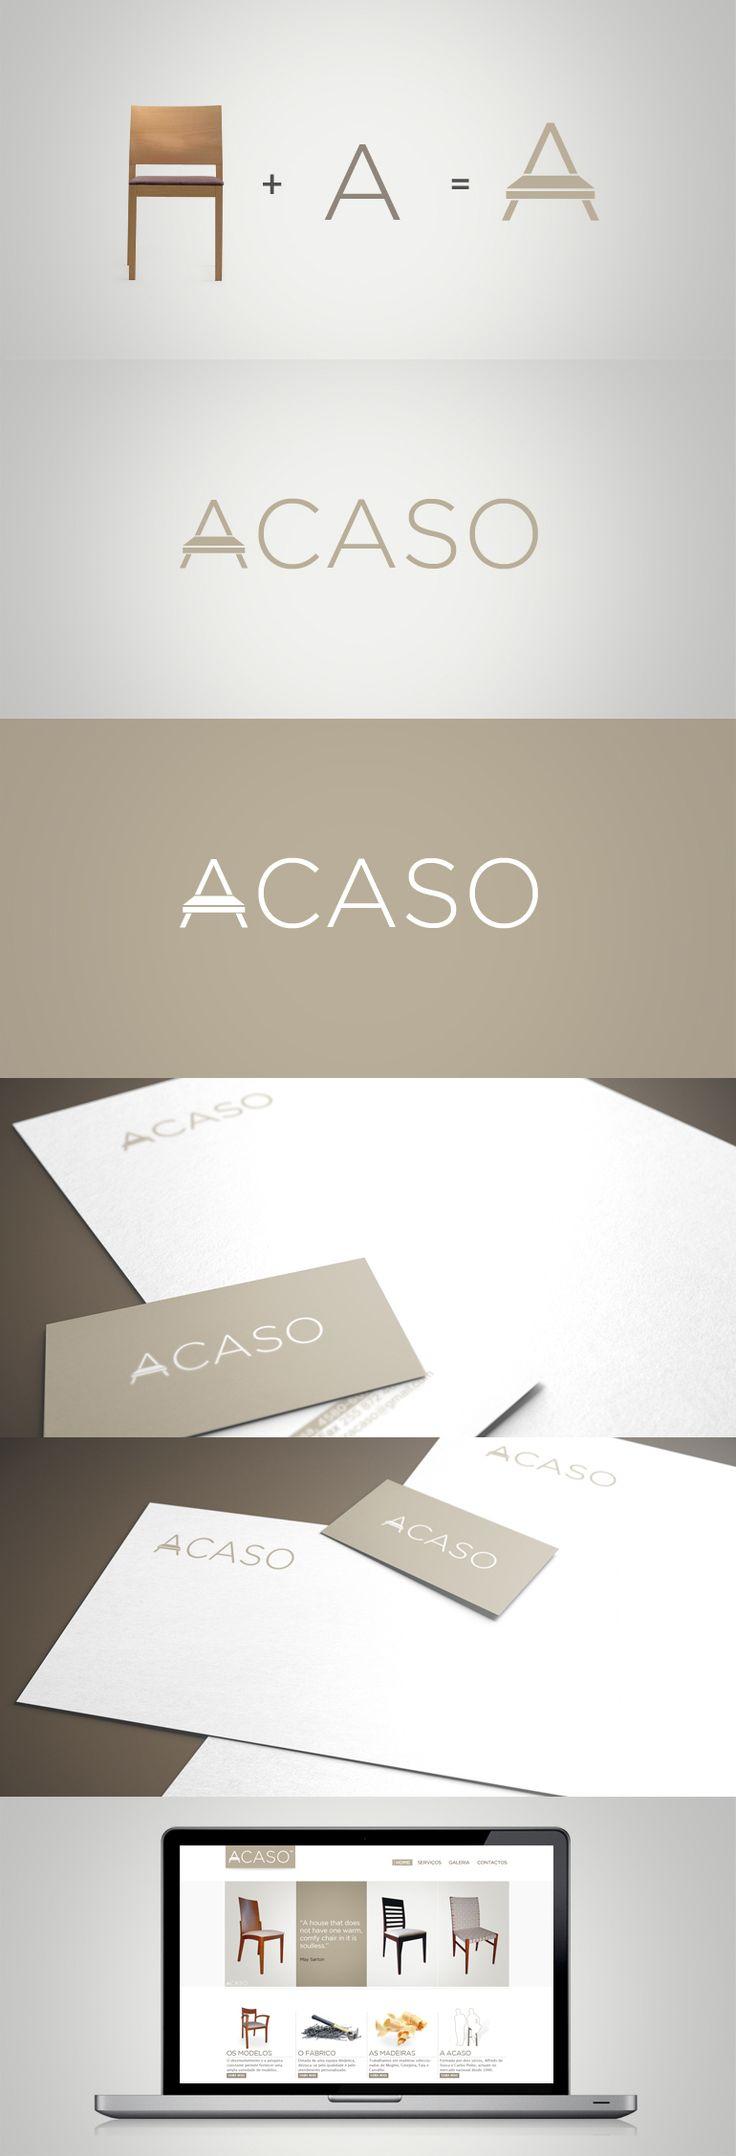 visual identity / Acaso